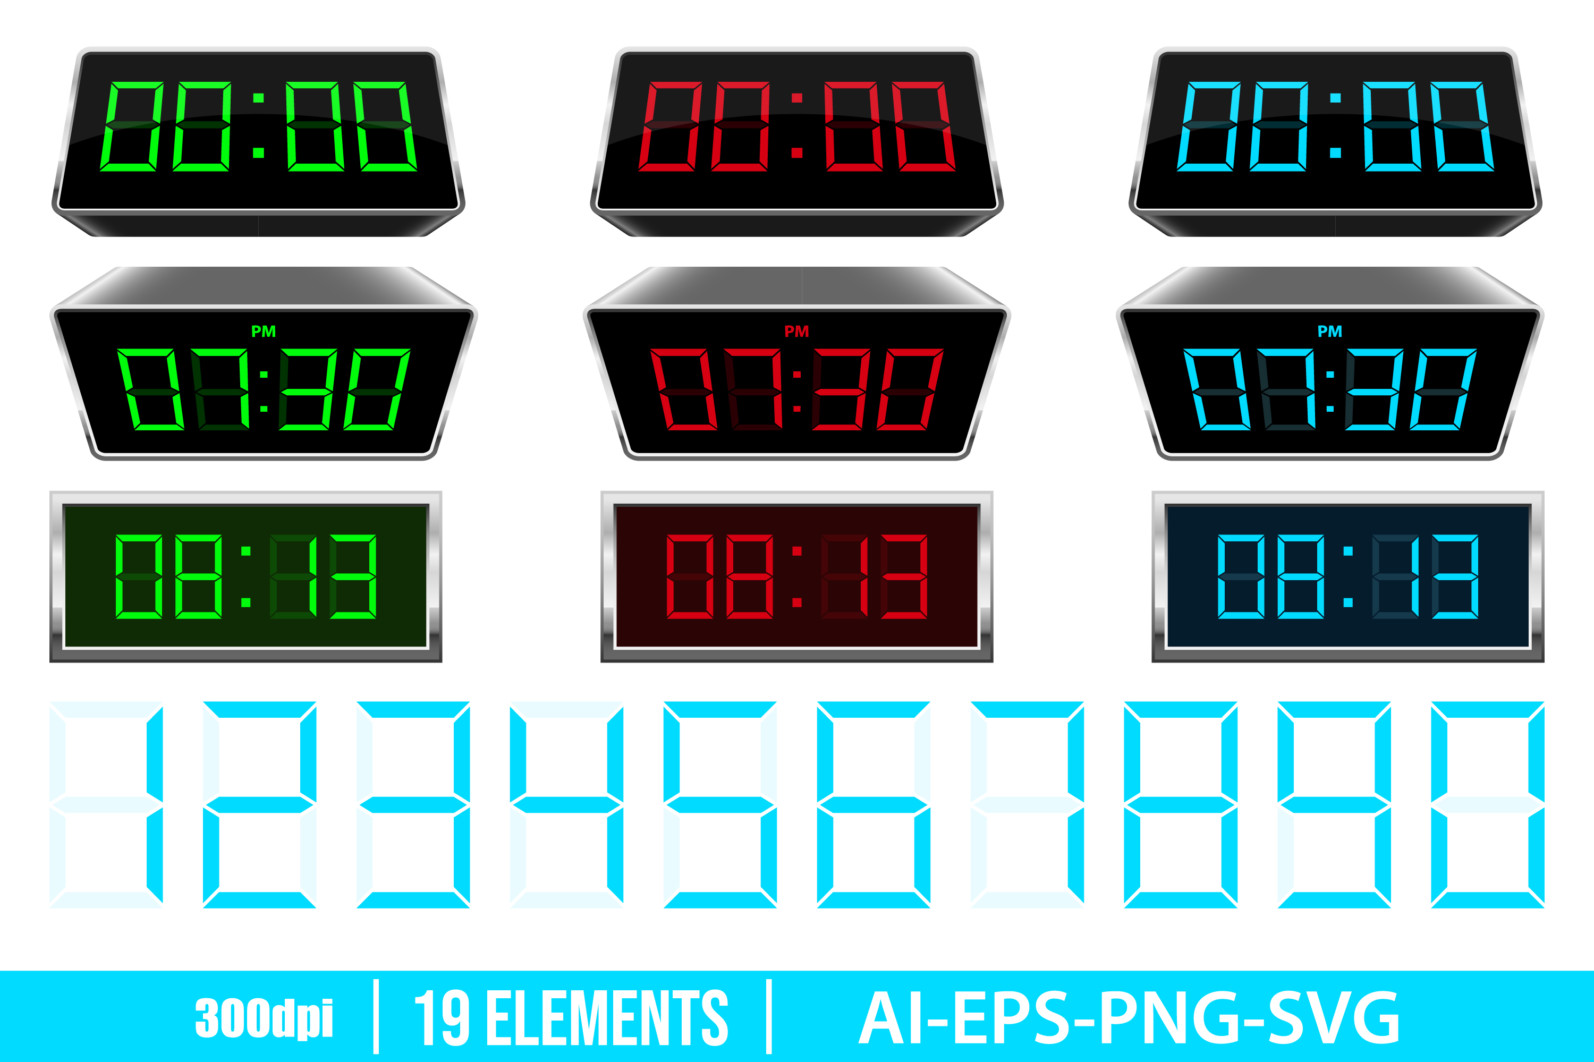 Digital clock clipart vector design illustration. Digital clock set. Vector Clipart Print - DIGITAL CLOCK scaled -